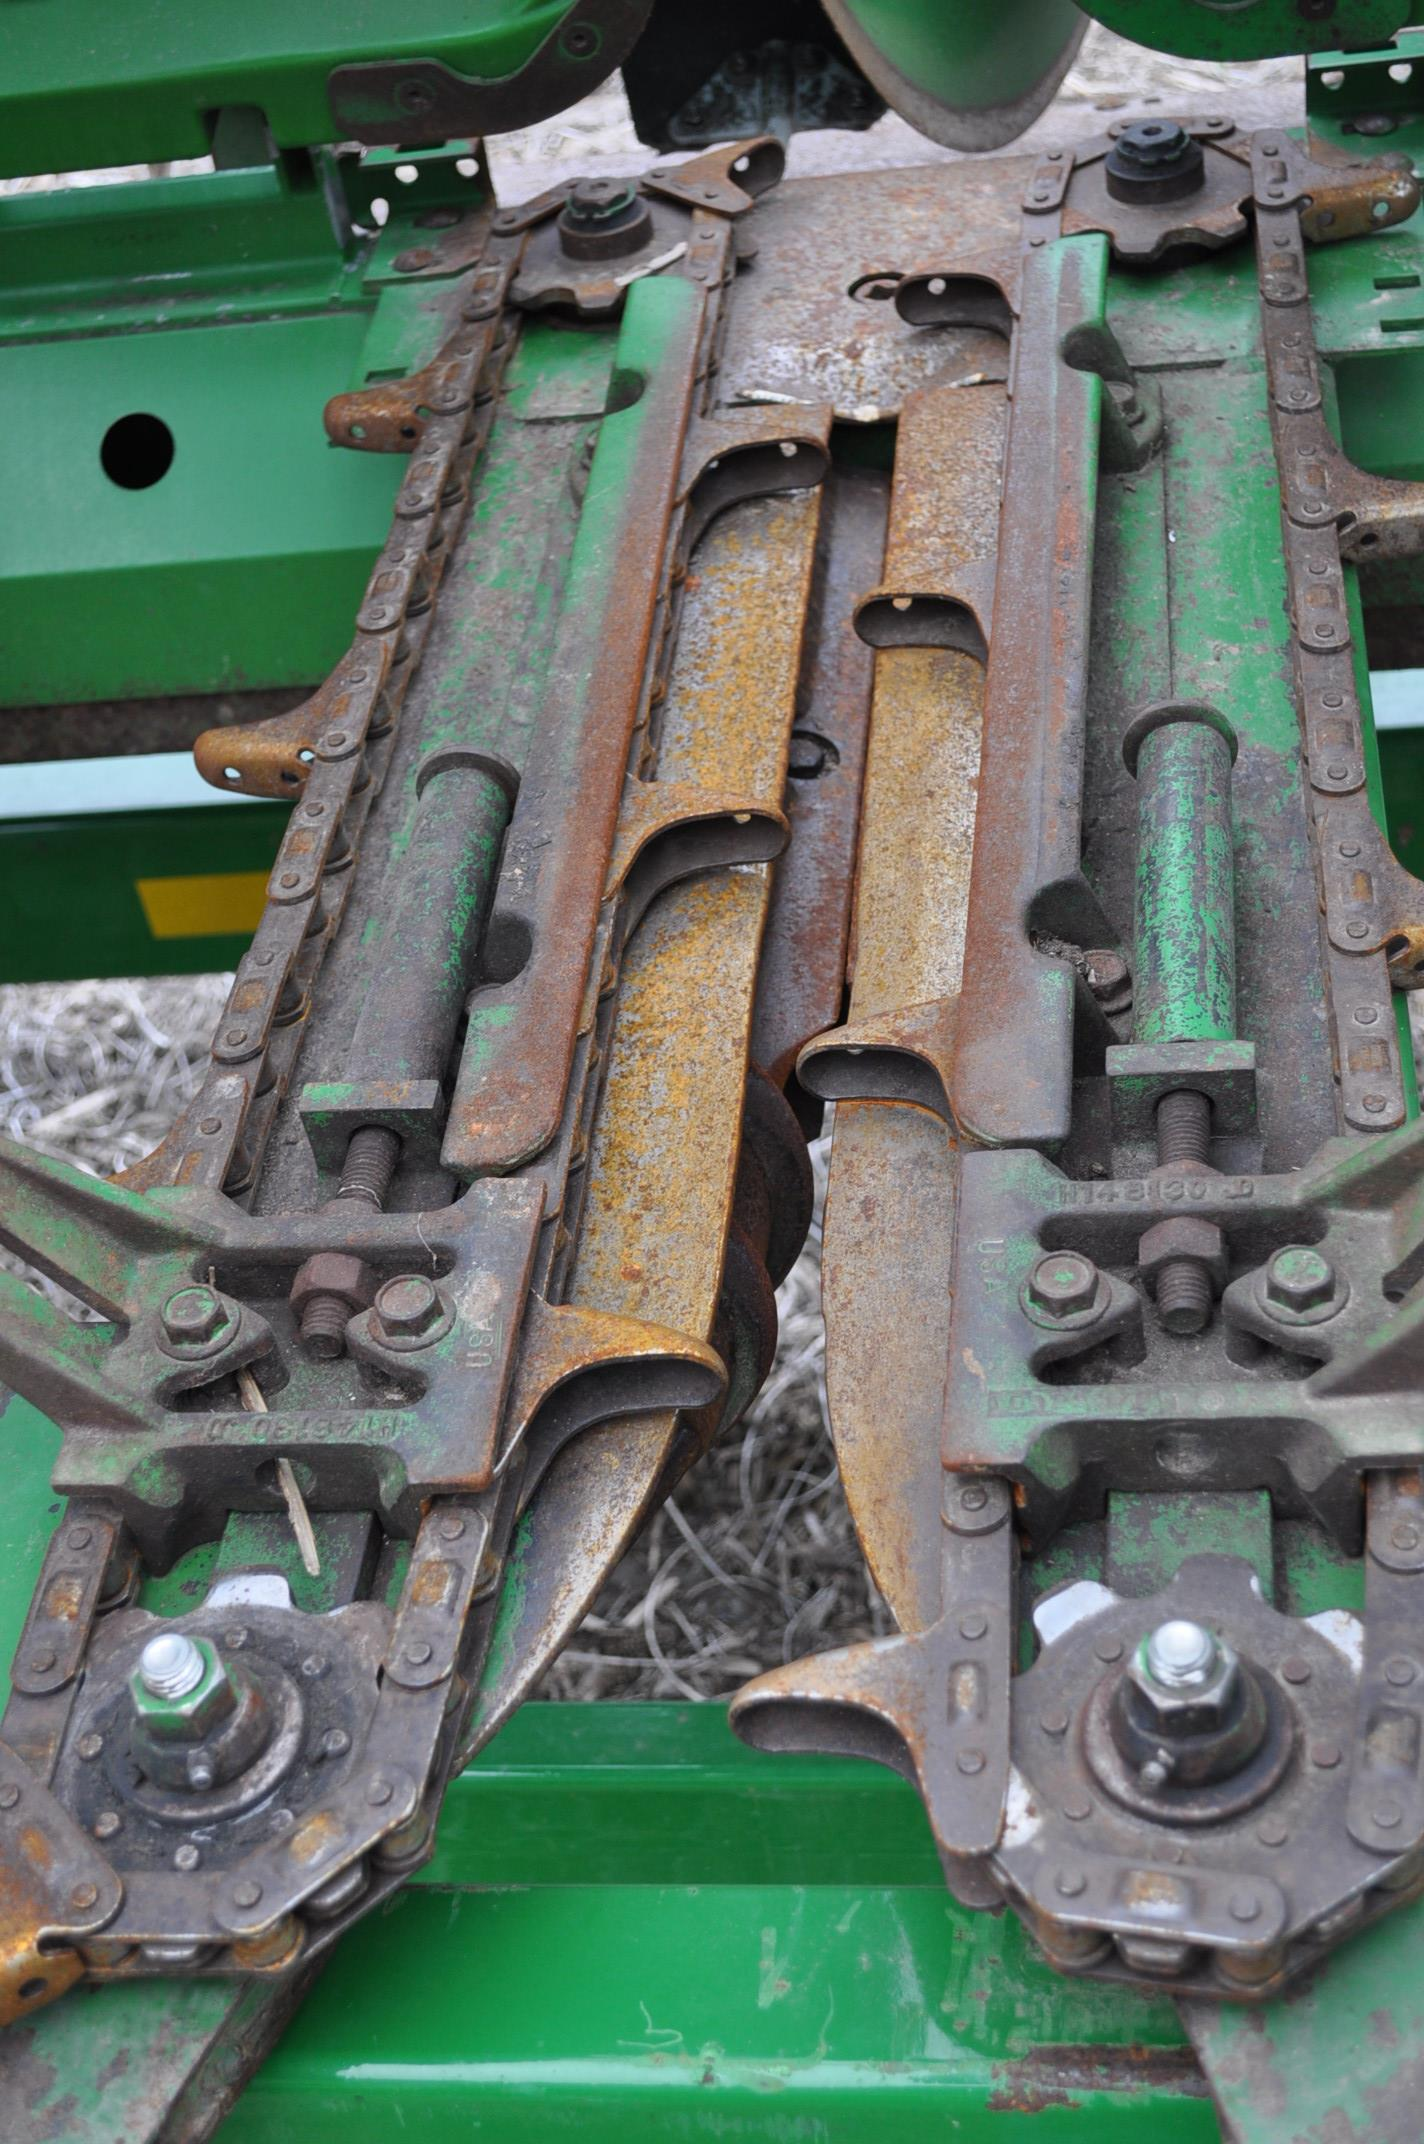 John Deere 693 corn head, poly, hyd drive, down corn reel, pto shafts, SN 655654 - Image 14 of 17